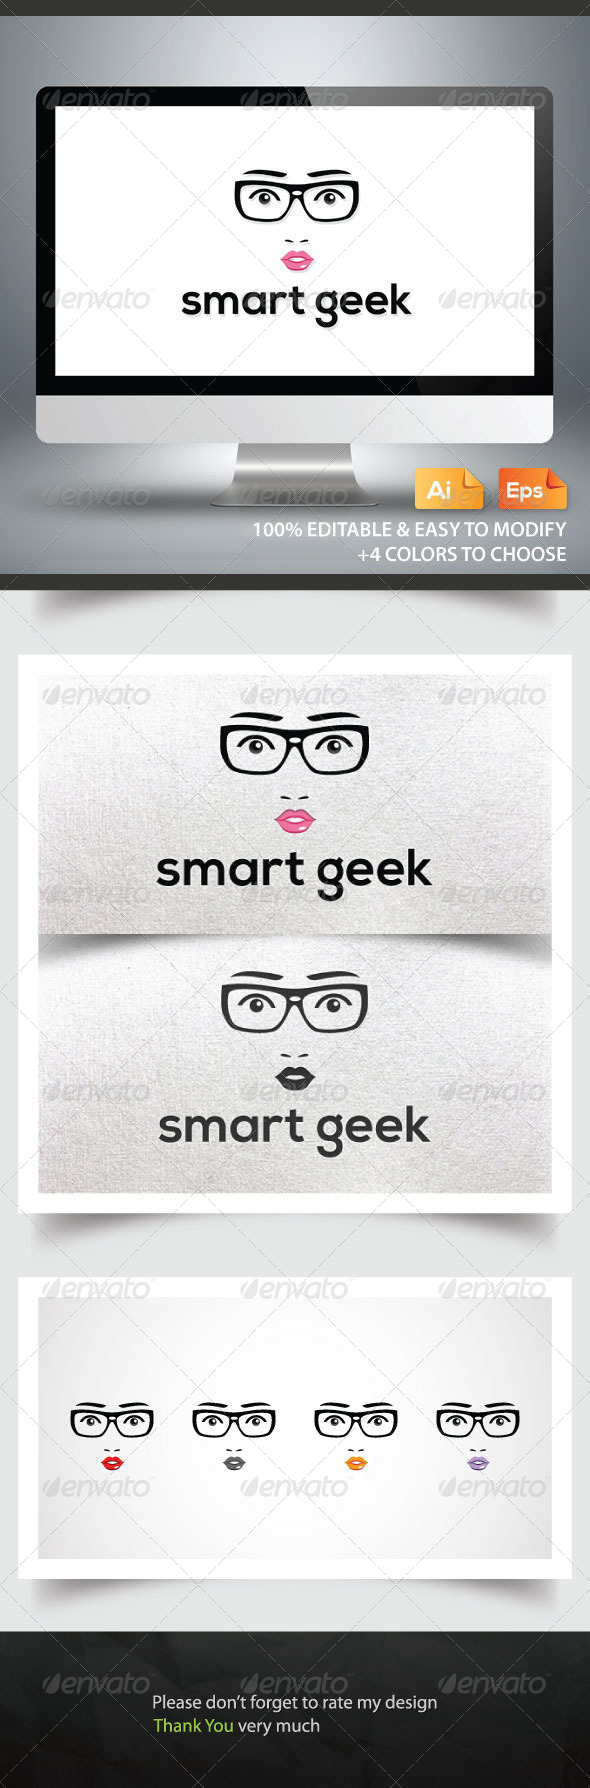 GraphicRiver Smart Geek 6232496